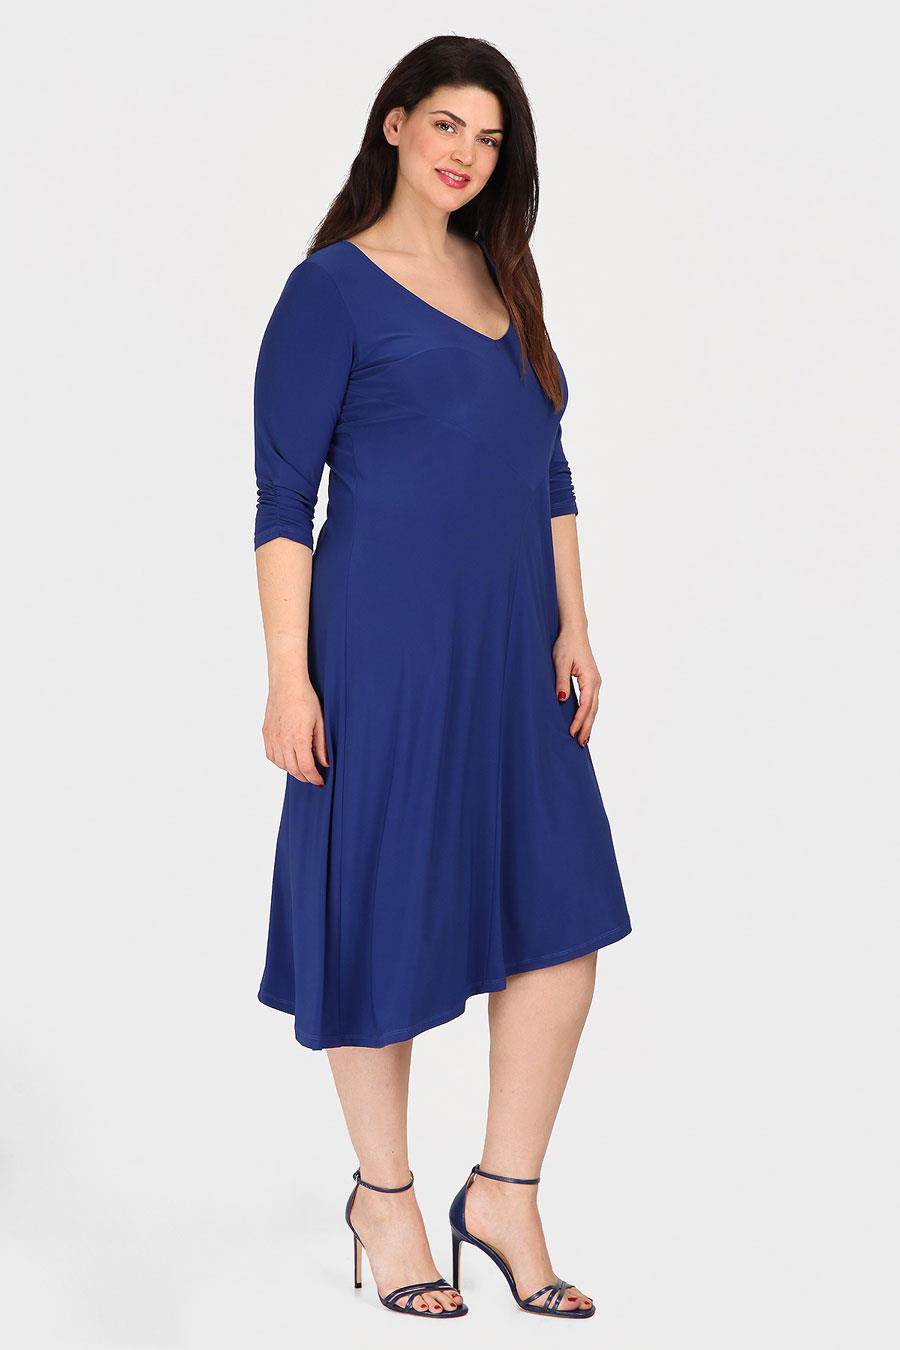 1eb97f58aa vestidos moda primavera verano 2019 para gorditas azul. Vestido midi en  color azul marino